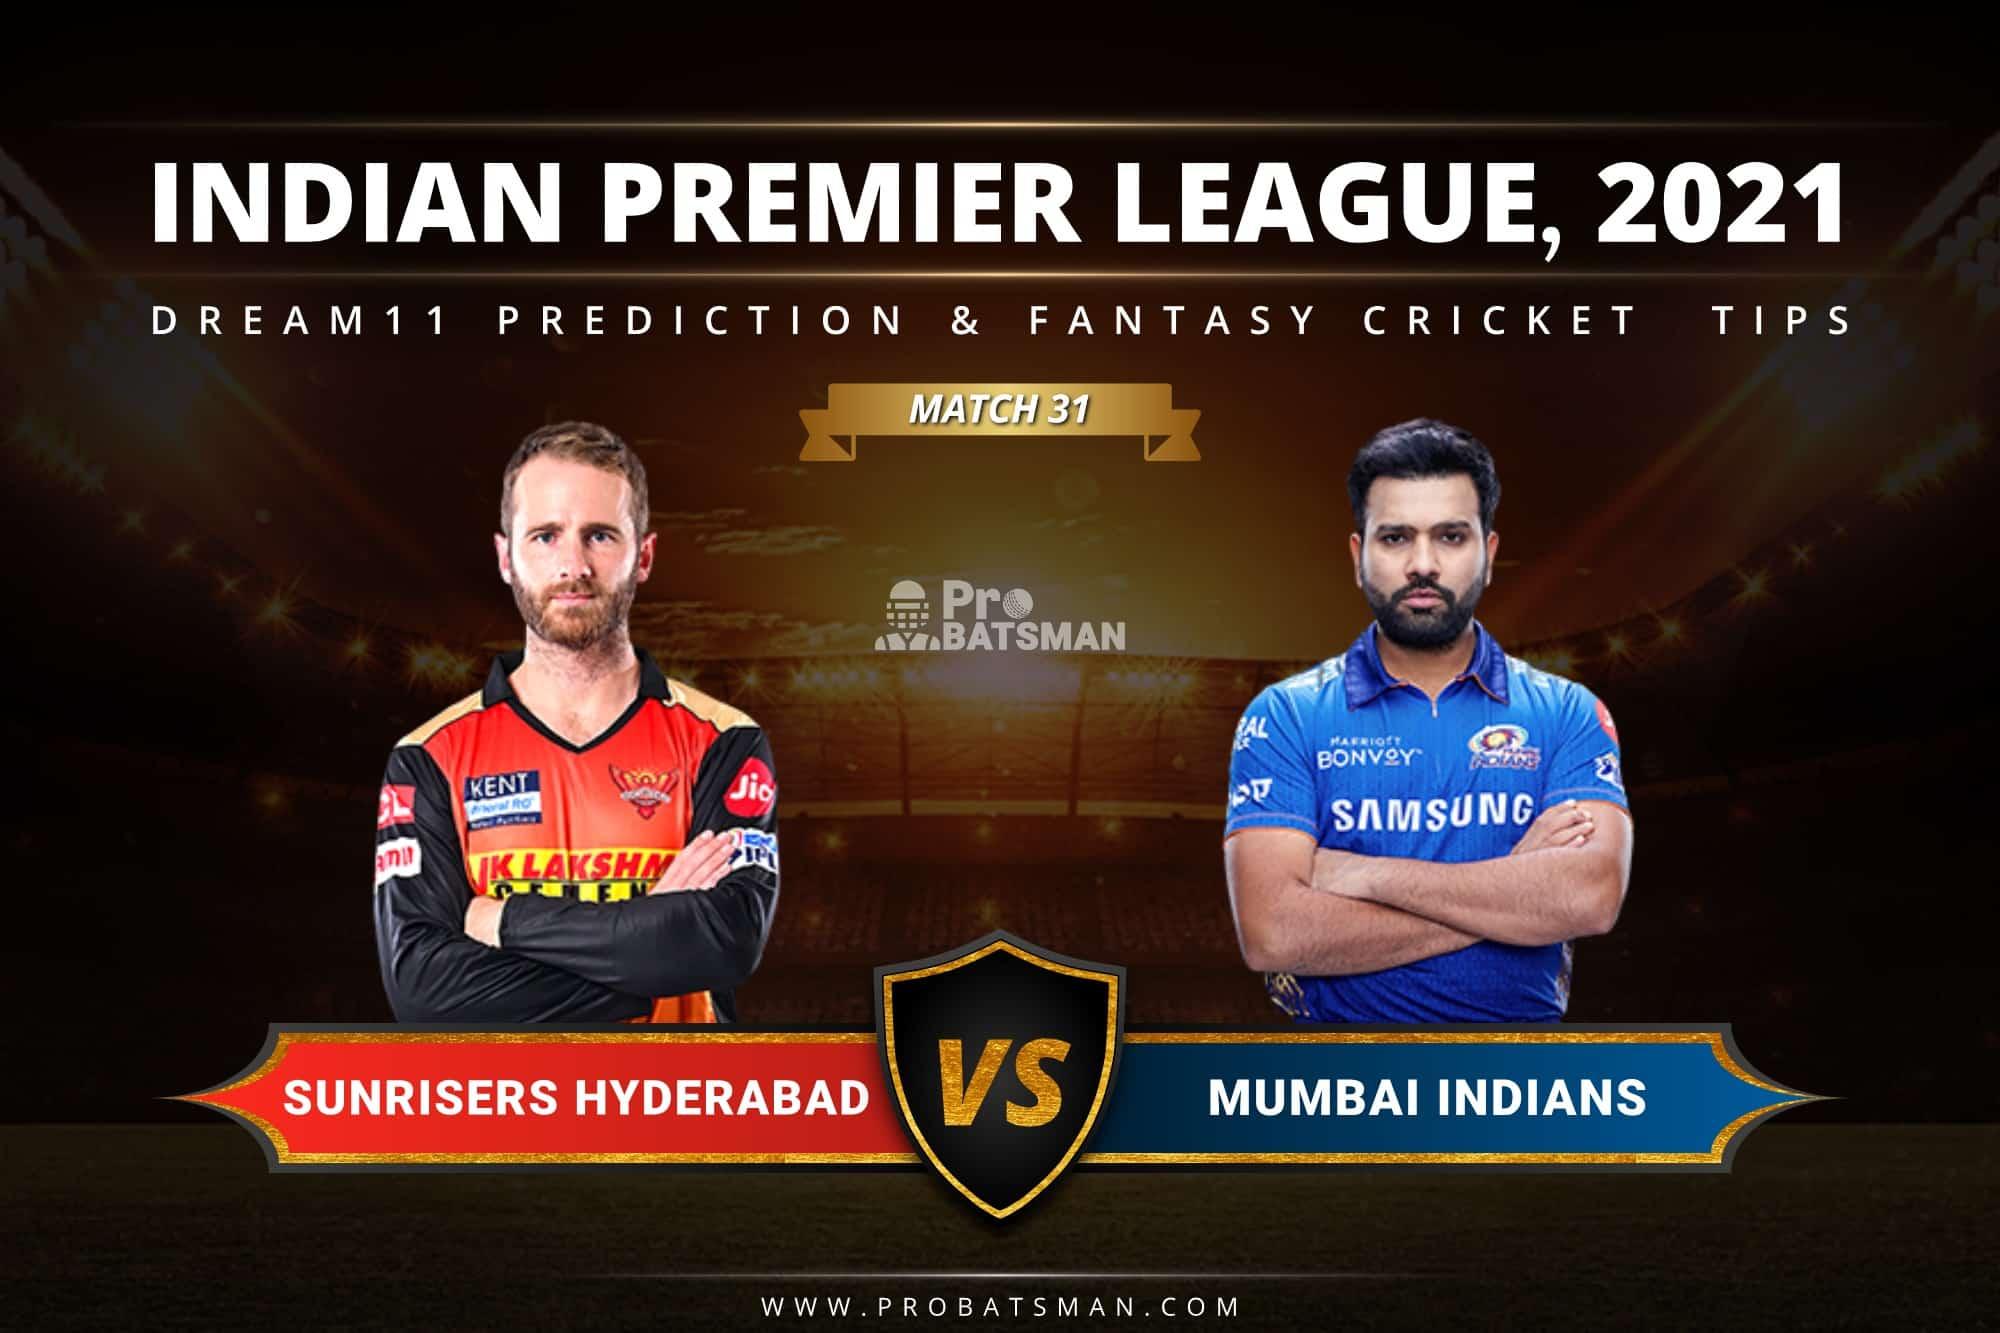 SRH vs MI Dream11 Prediction: Fantasy Cricket Tips, Playing XI, Pitch Report, Stats & Injury Updates of Match 31, IPL 2021